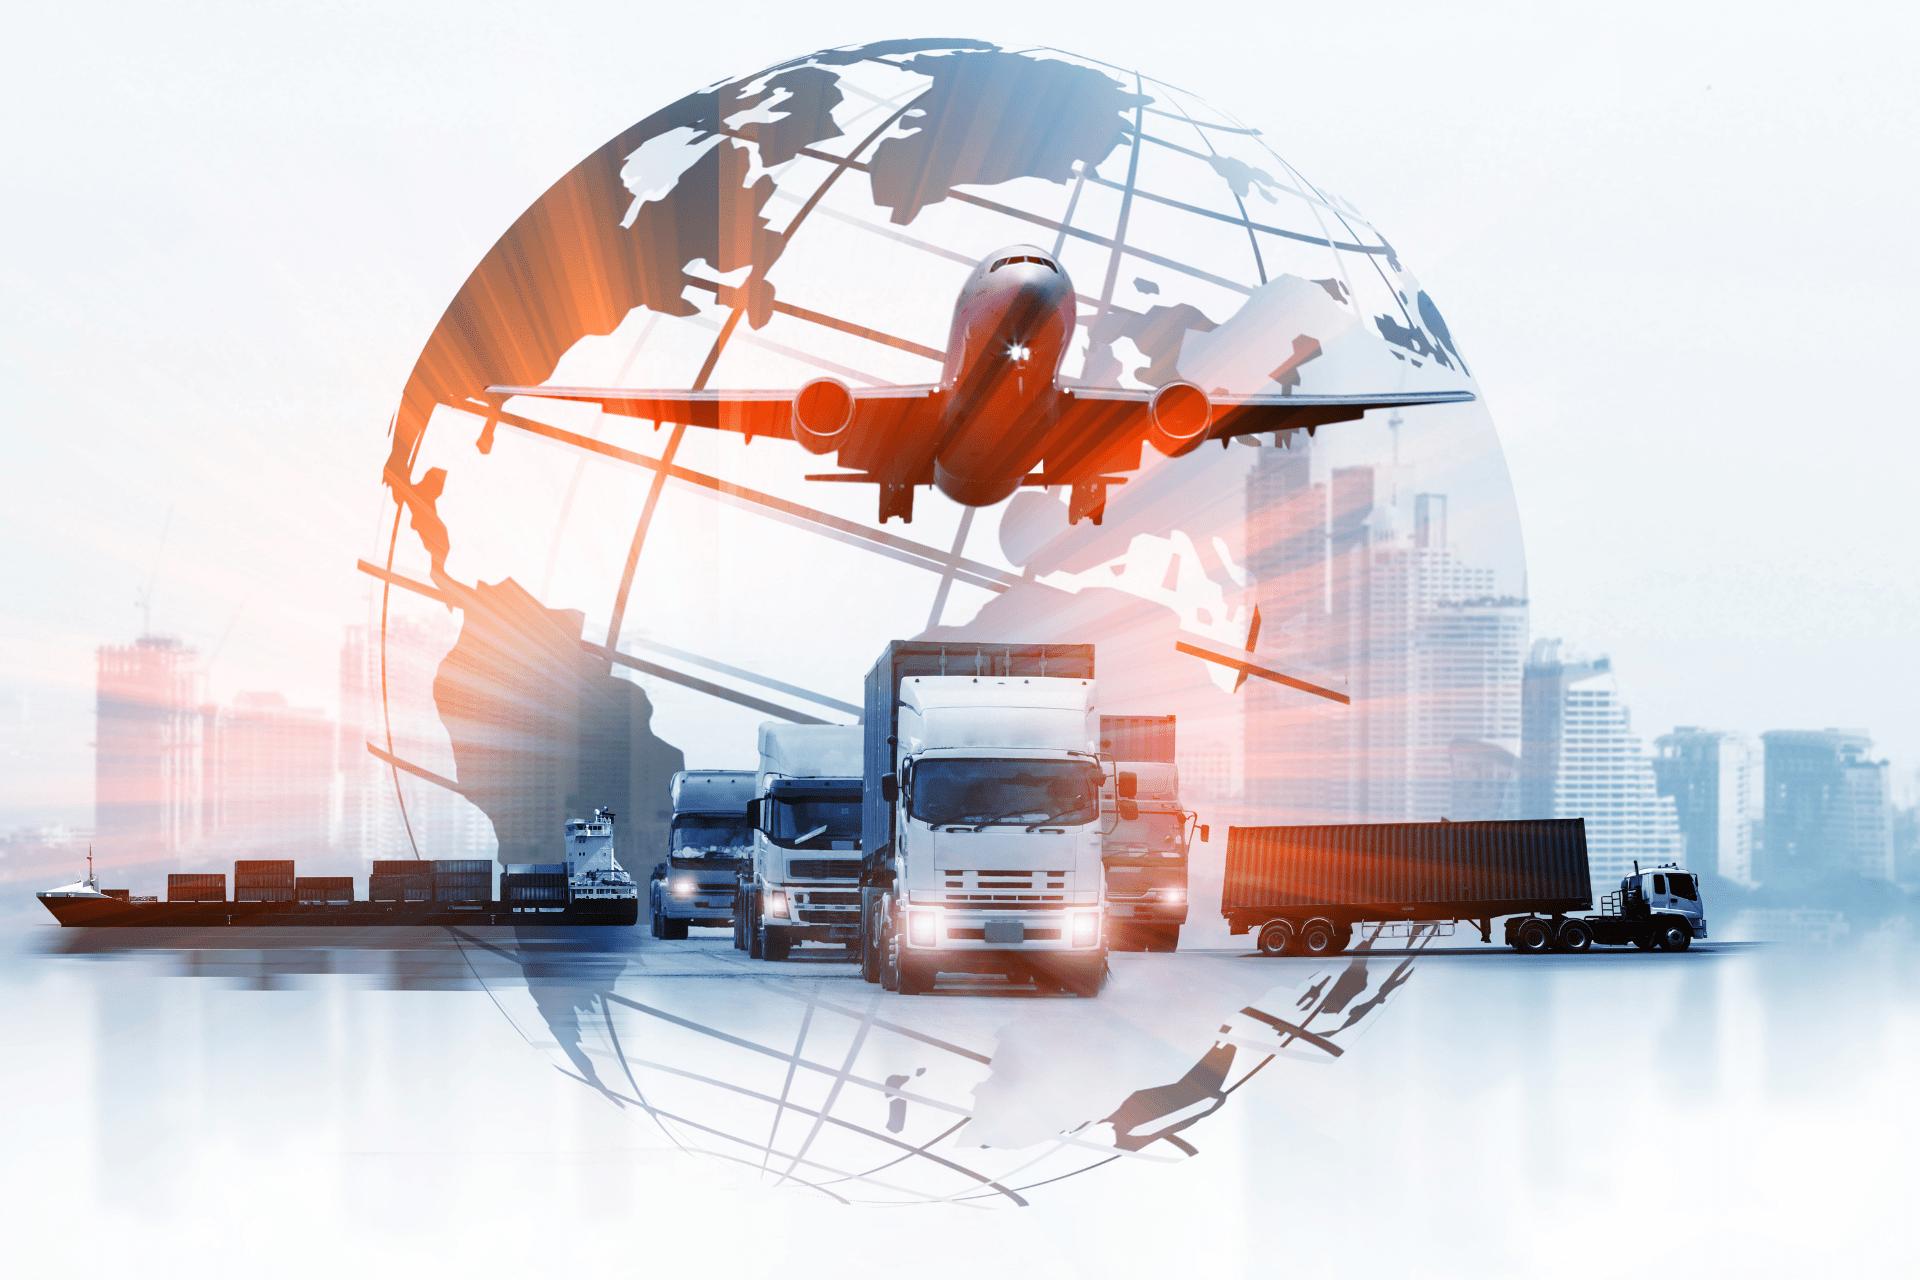 Logistica en Centroamerica como un Reto Permanente